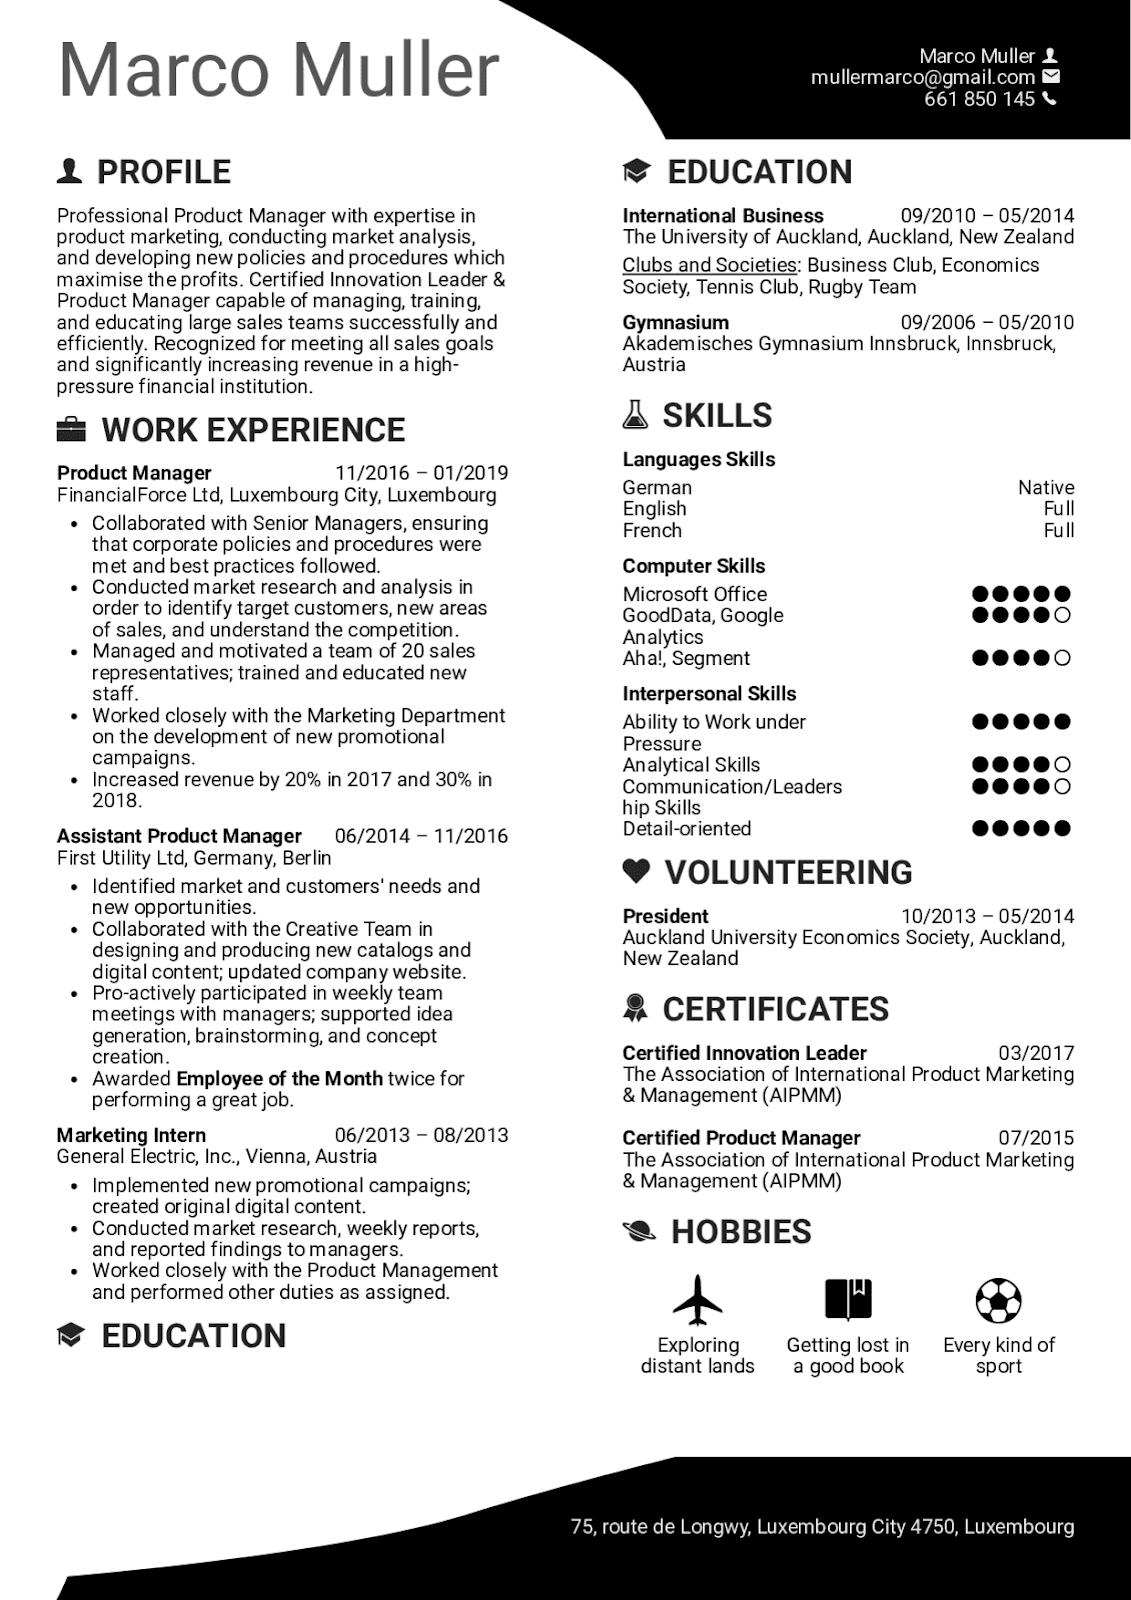 Resume Samples 2020 panosundaki Pin